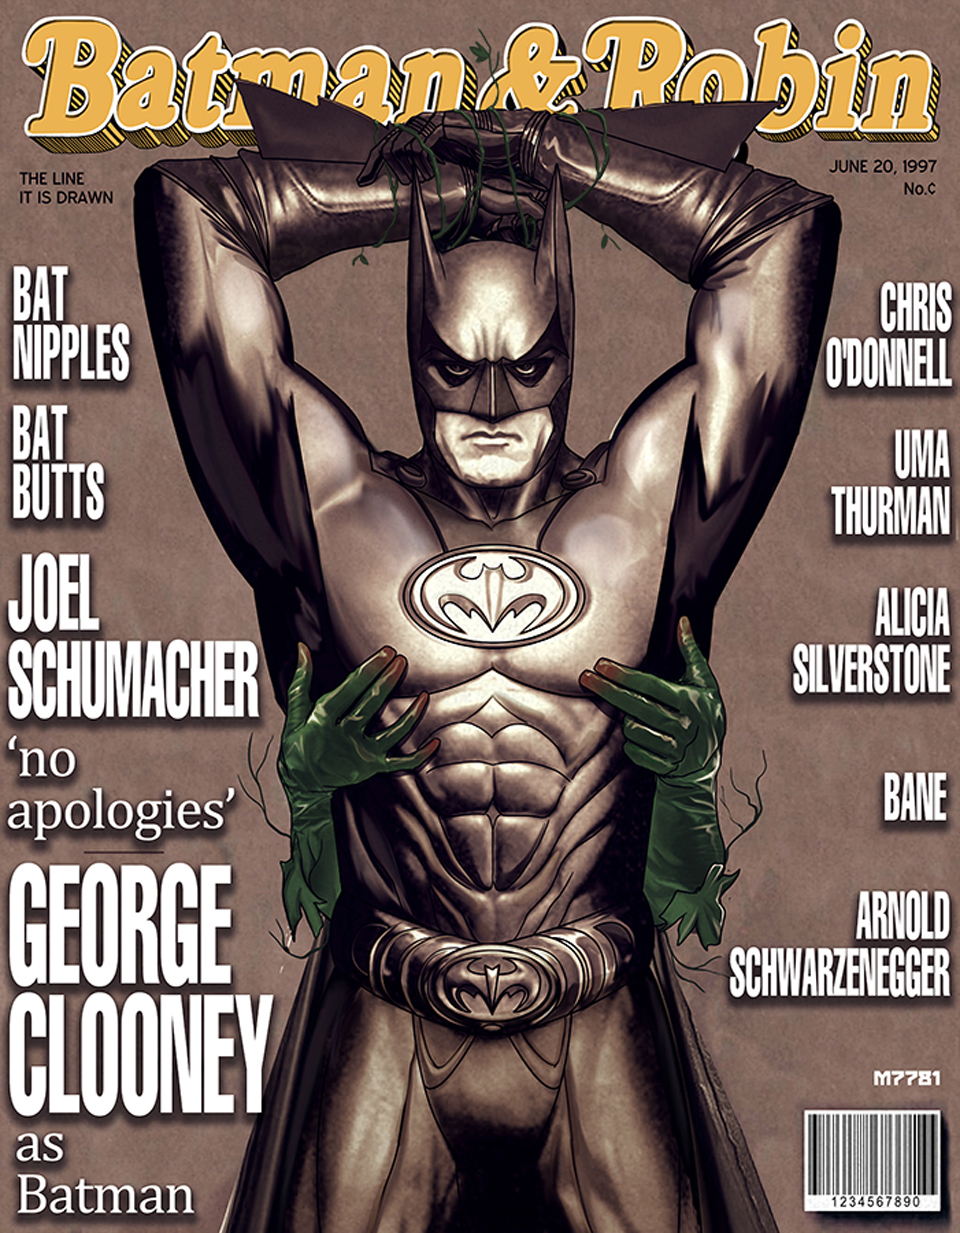 Batman & Robin Rolling Stone Parody